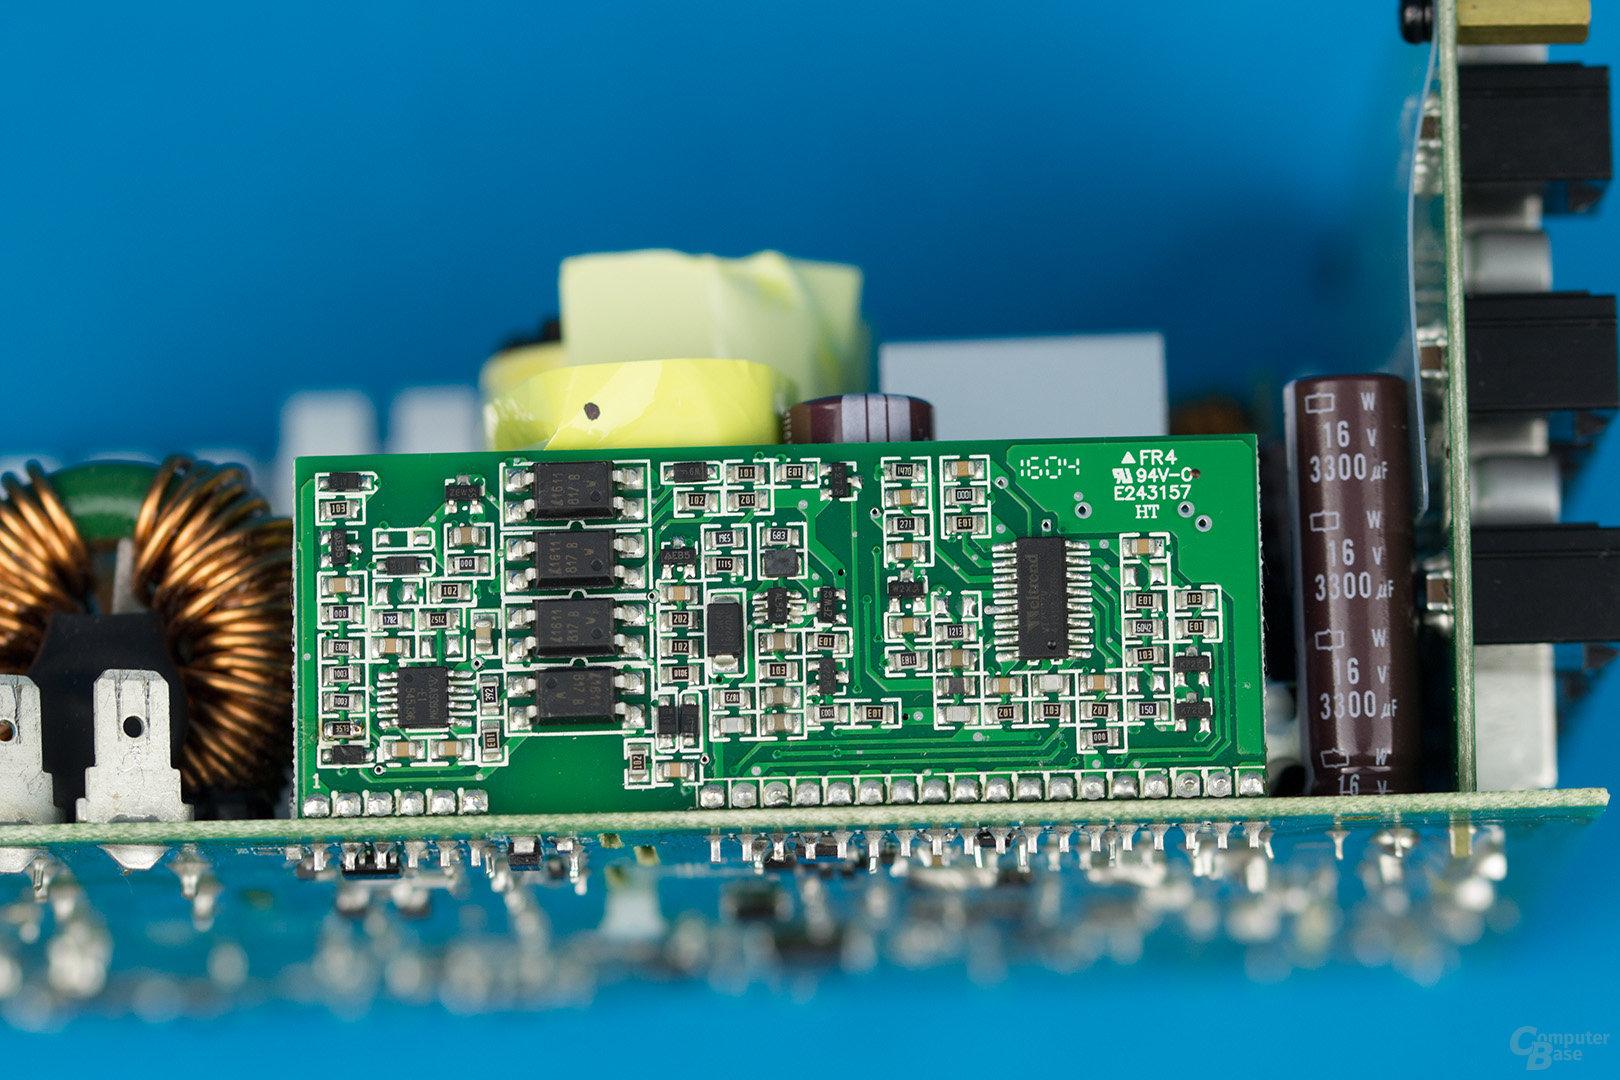 Sea Sonic Prime Platinum 850W – Vertikale Platine mit Supervisor IC